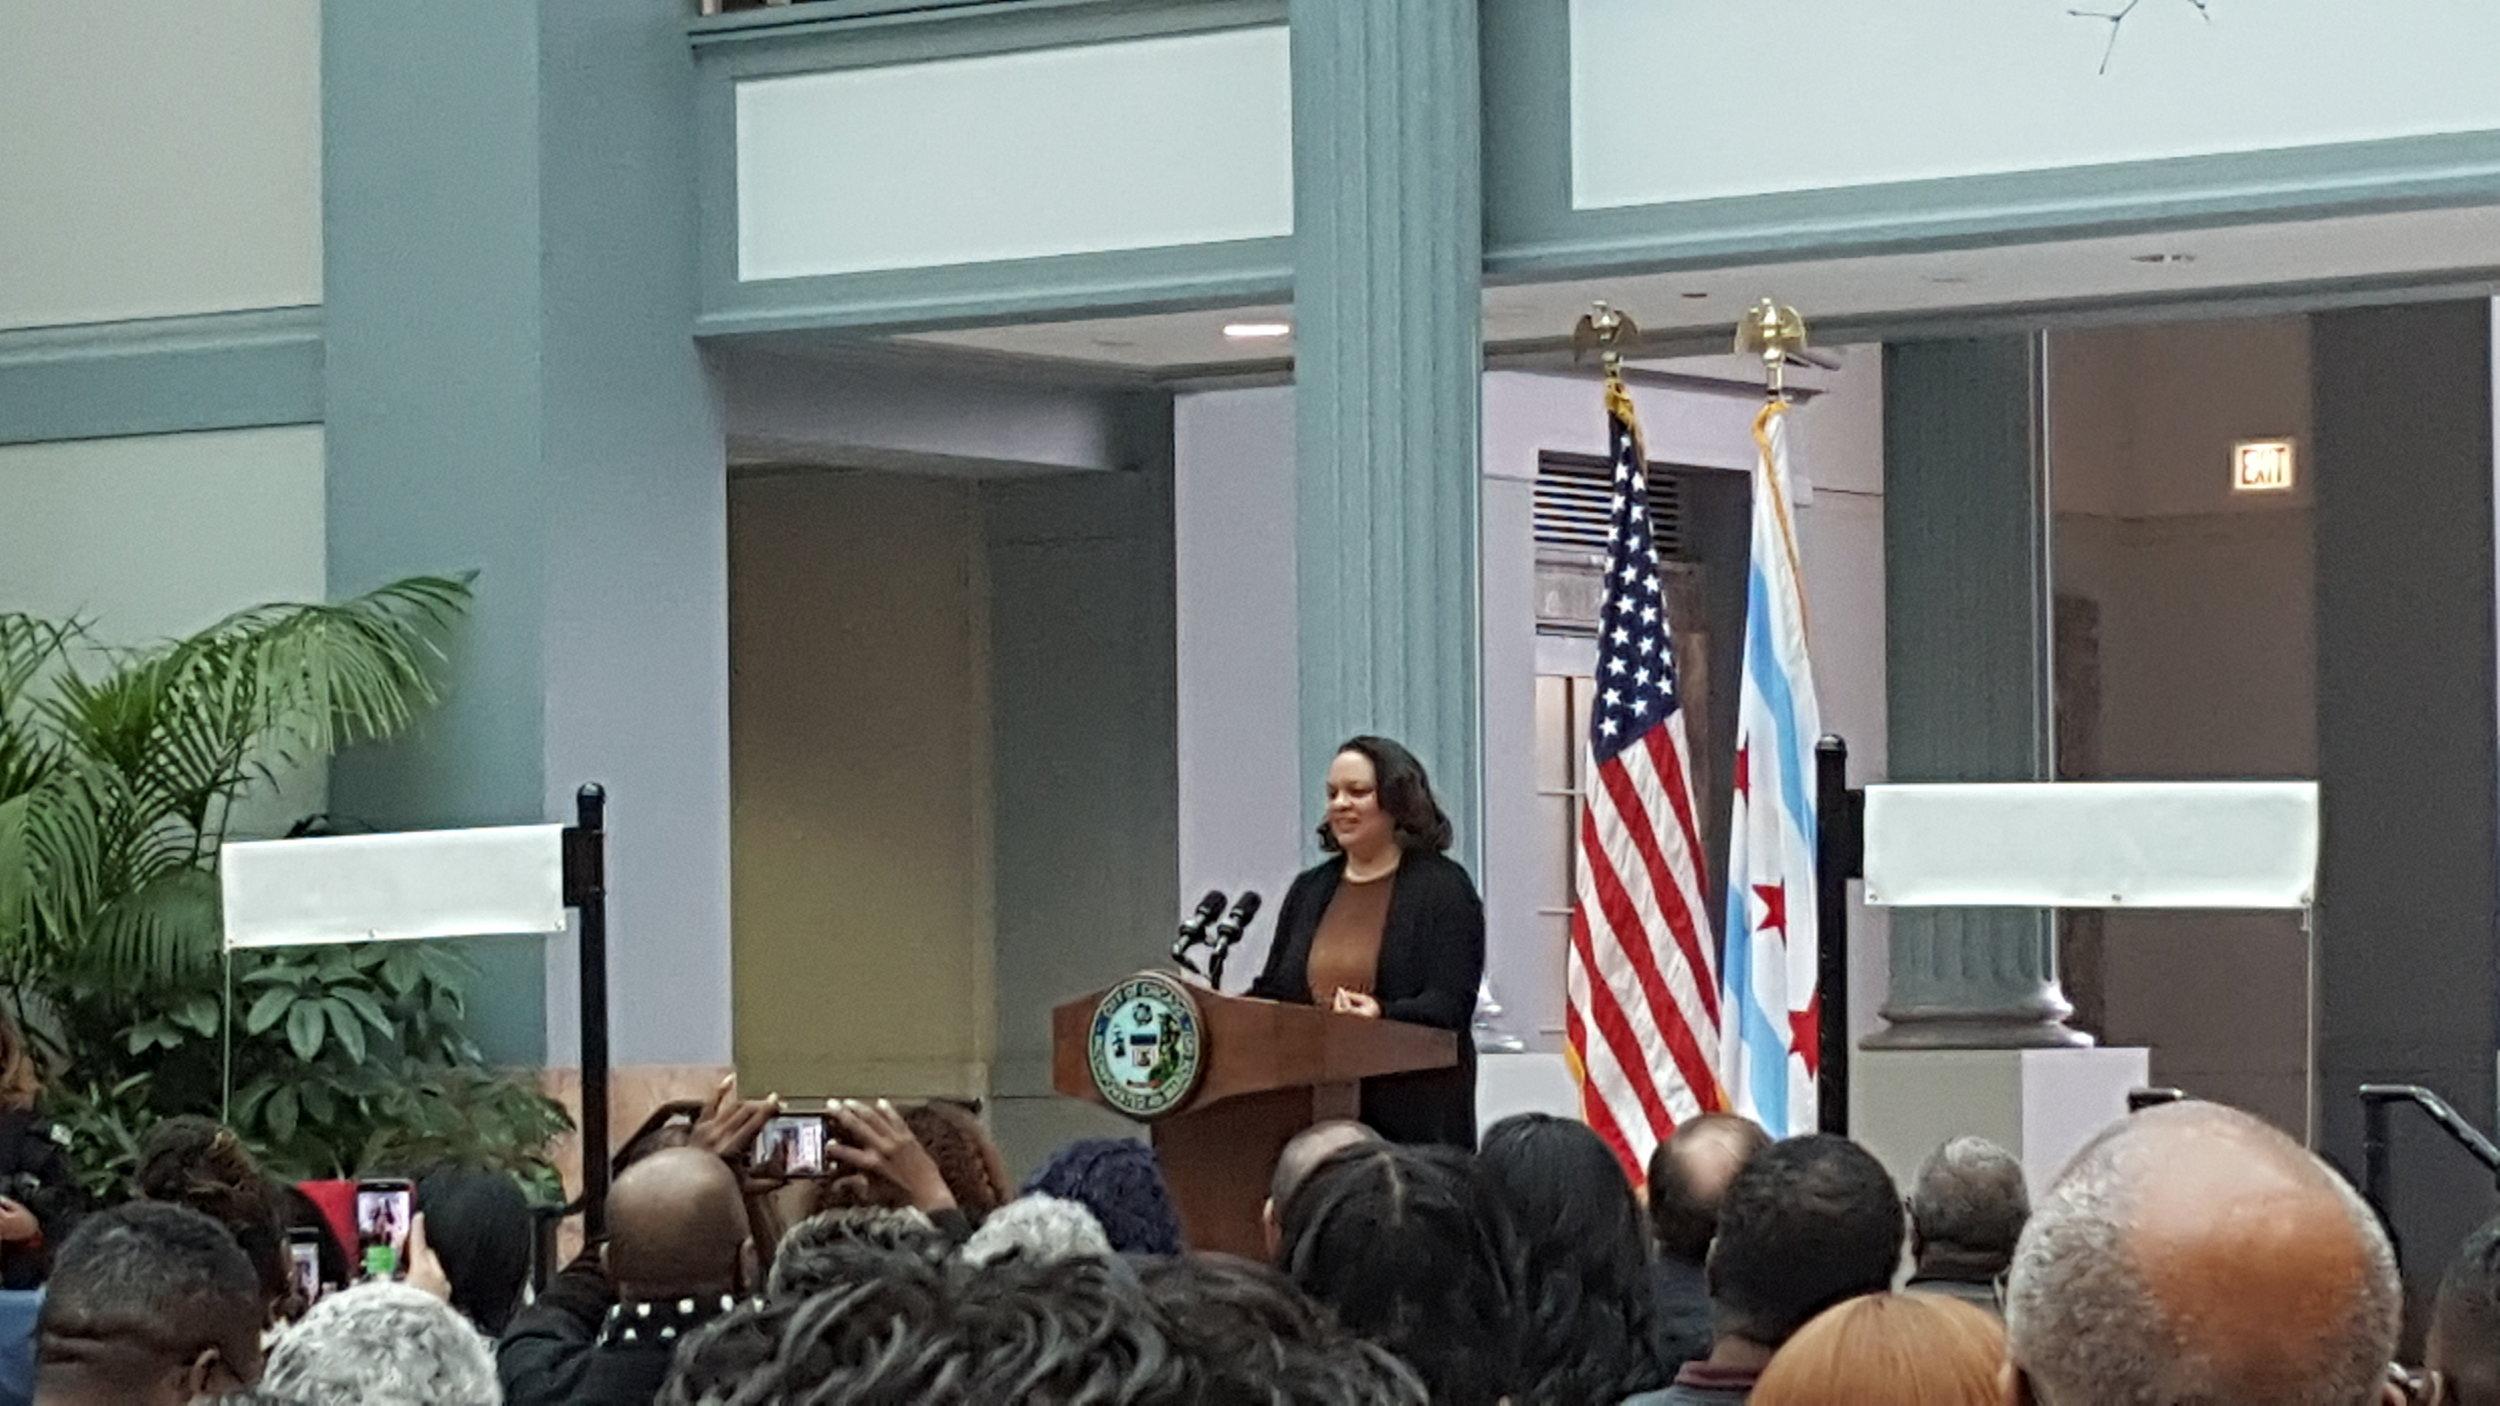 20190211_michelle duster_ida b wells unveiling_honorary chicago.jpg